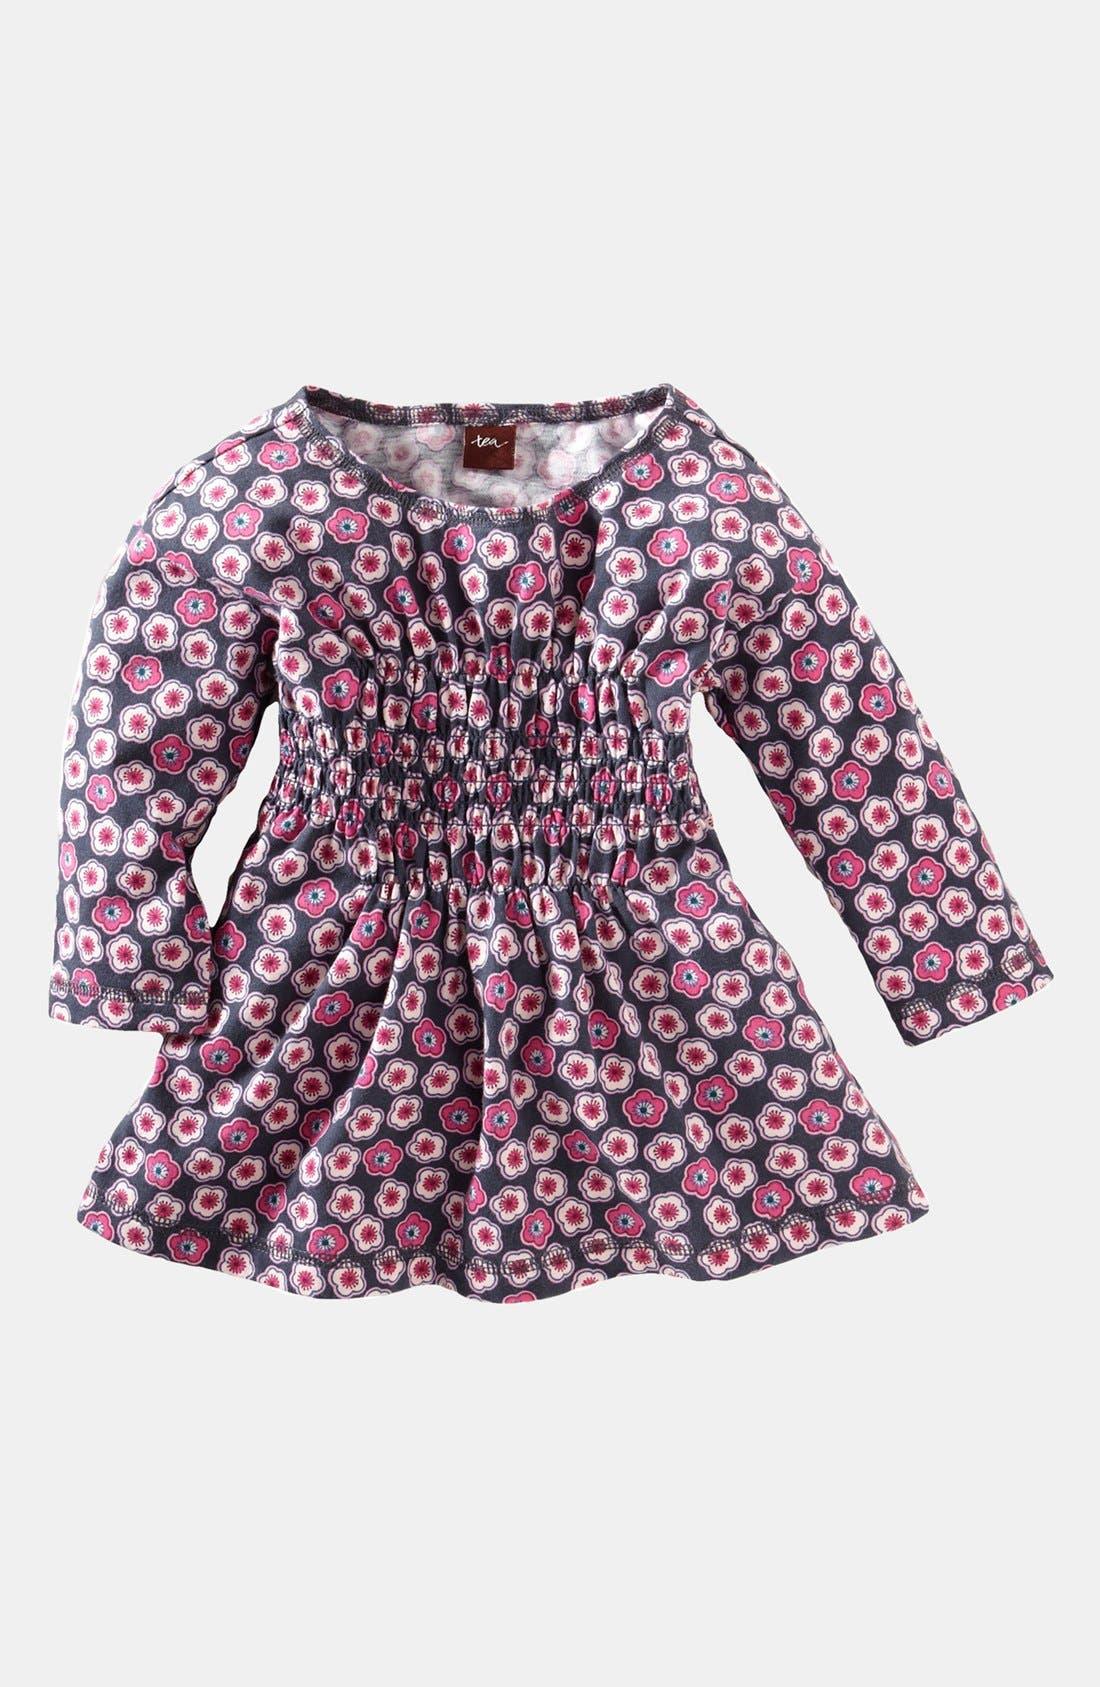 Main Image - Tea Collection 'Cherry Blossom' Smocked Tunic (Little Girls & Big Girls)